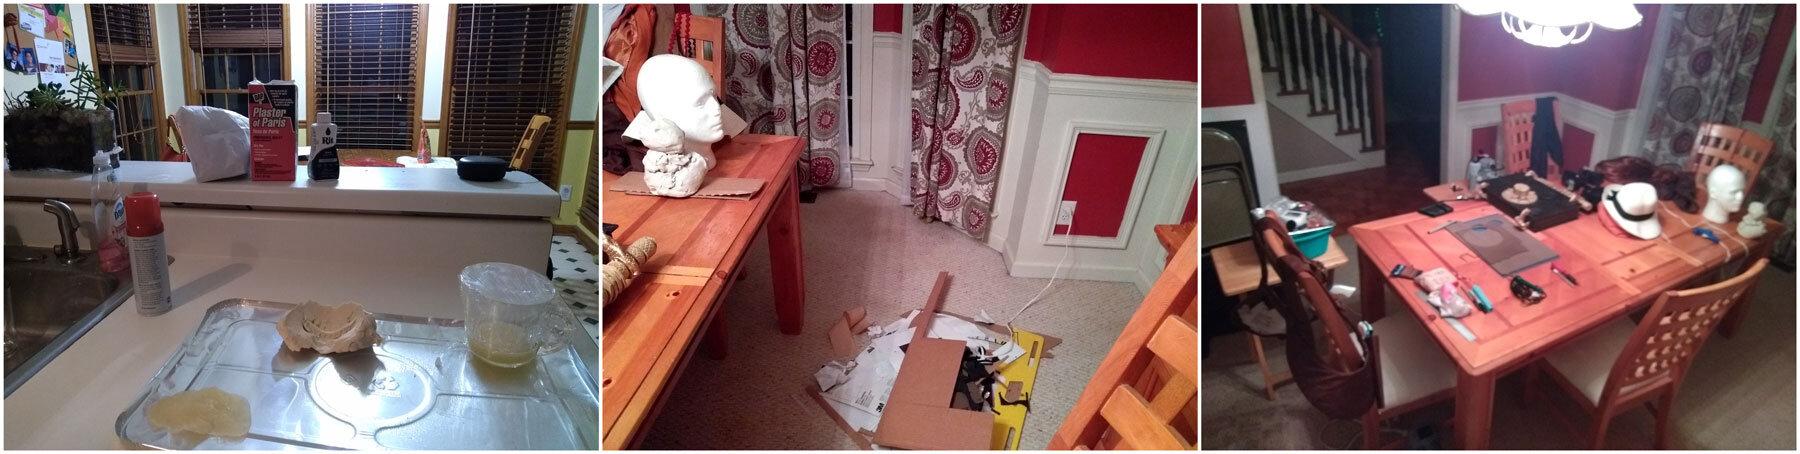 house-mess.jpg